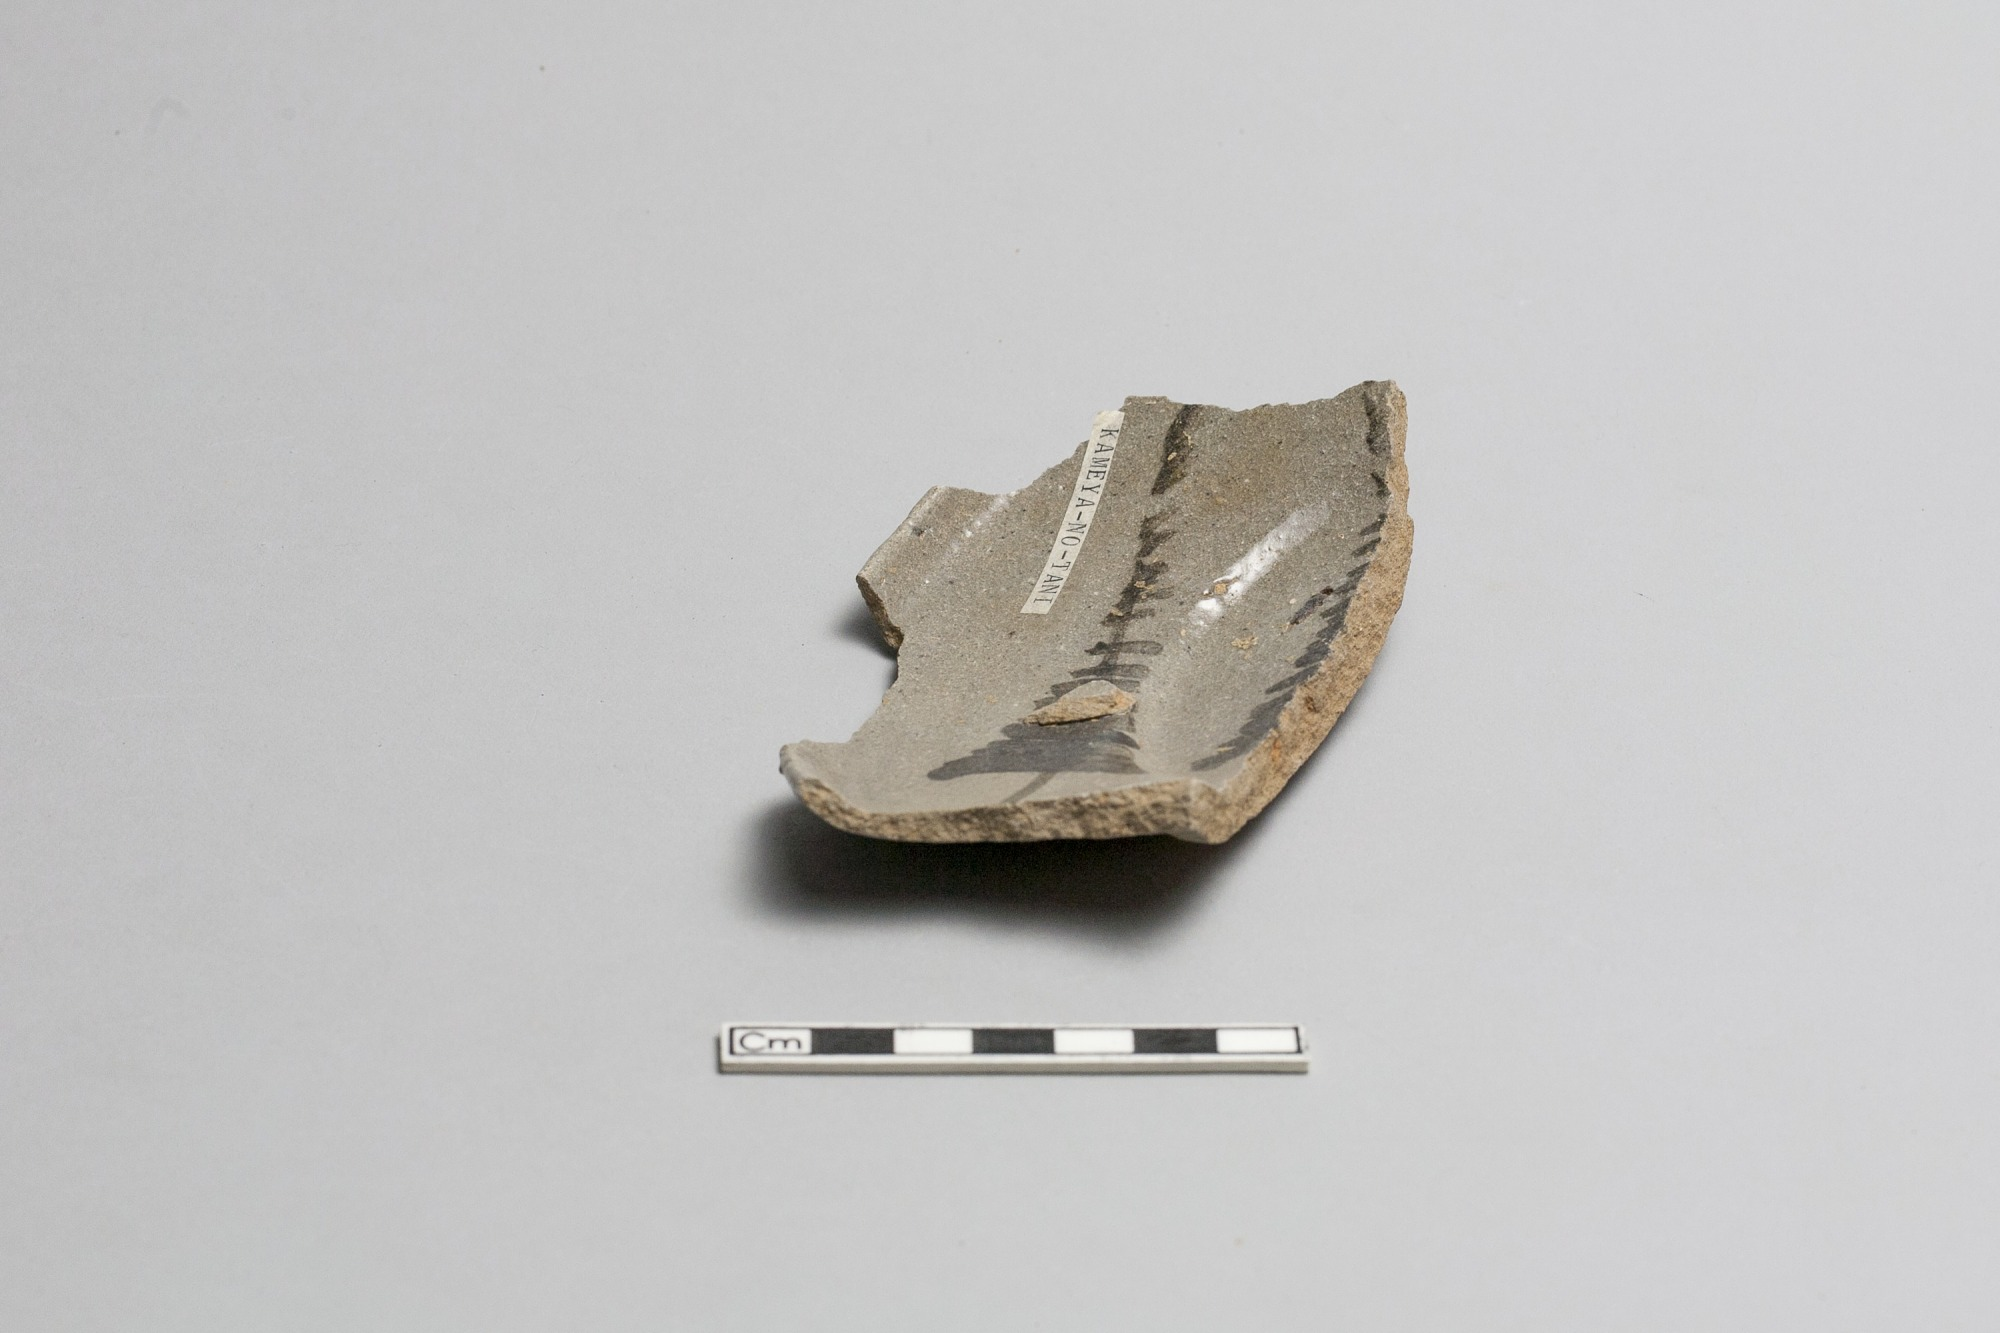 Bowl fragment (rim)